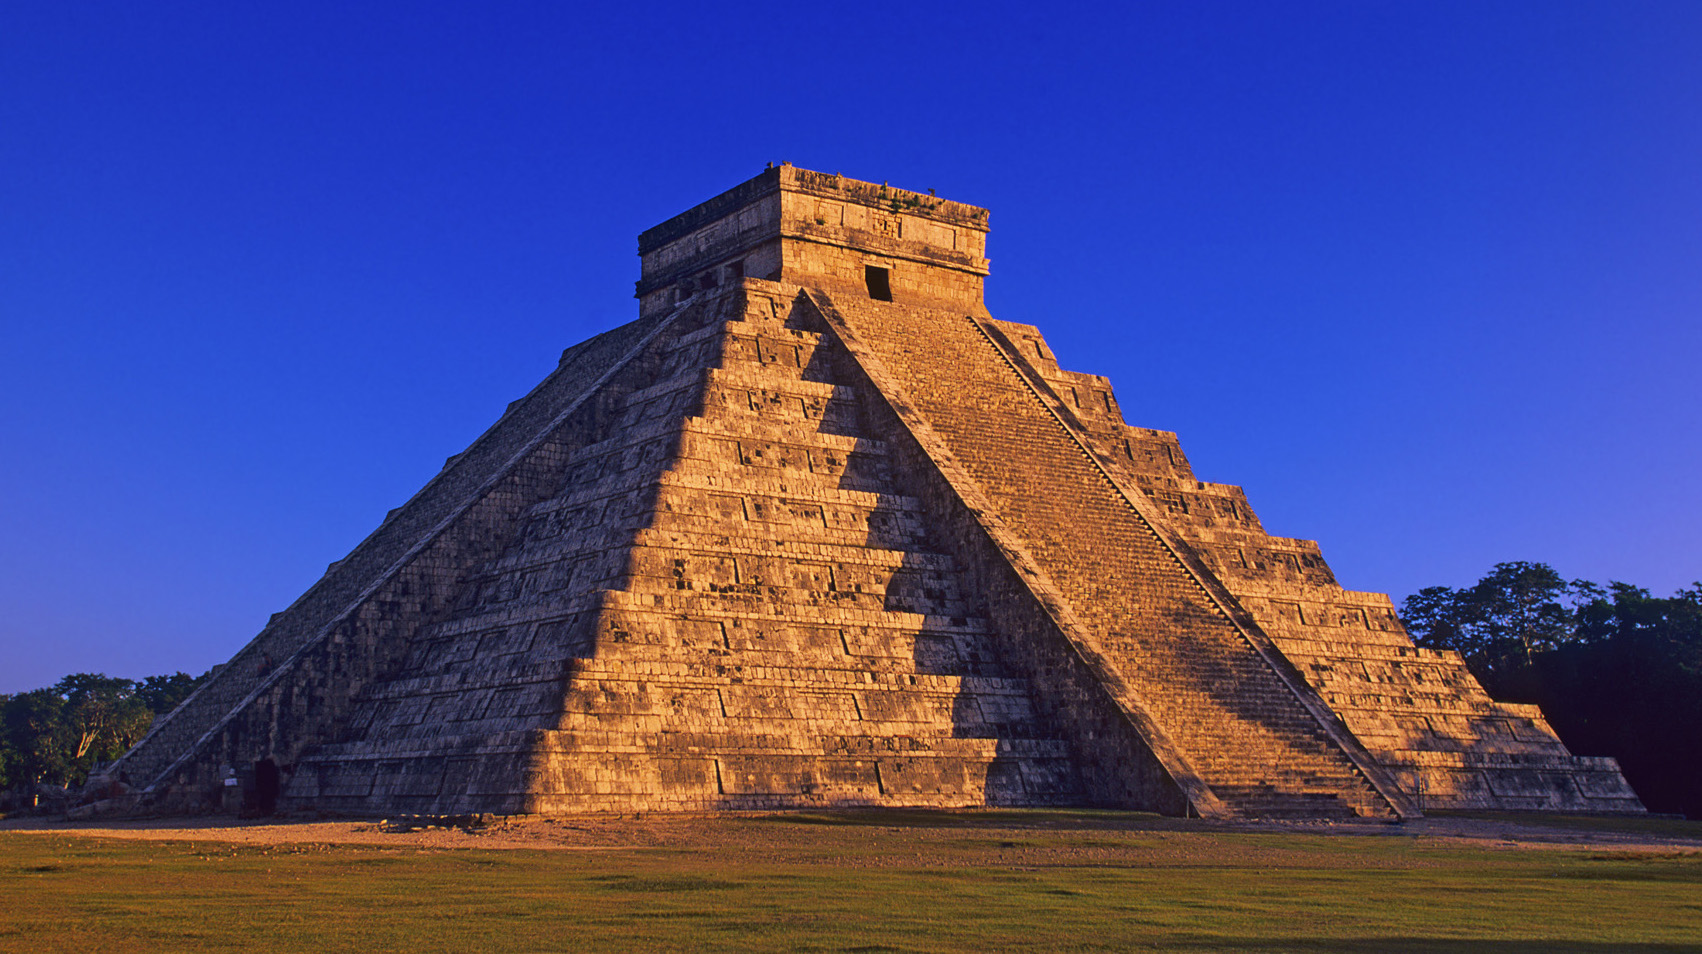 La pirámide de Kukulkan al atardecer (Mayan Pyramid of Kukulkan)